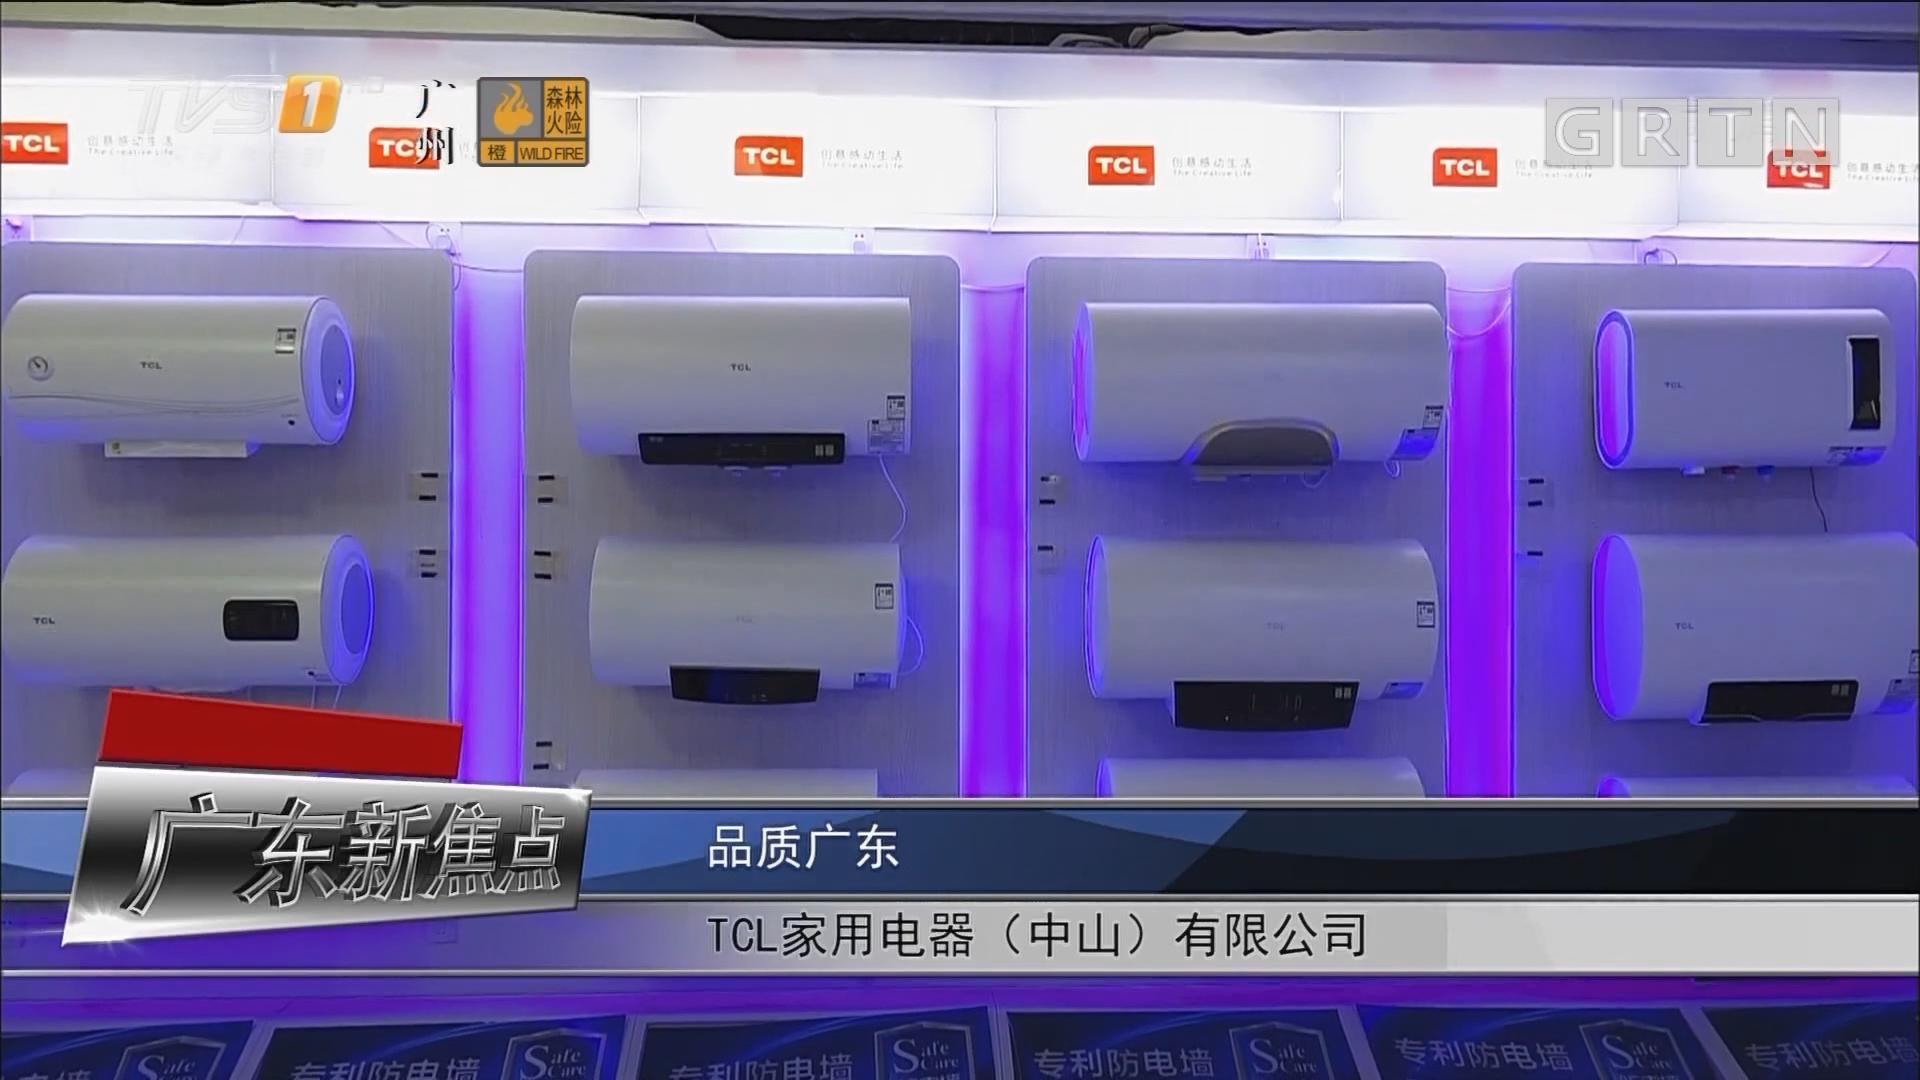 [HD][2019-01-26]广东新焦点:品质广东:TCL家用电器(中山)有限公司